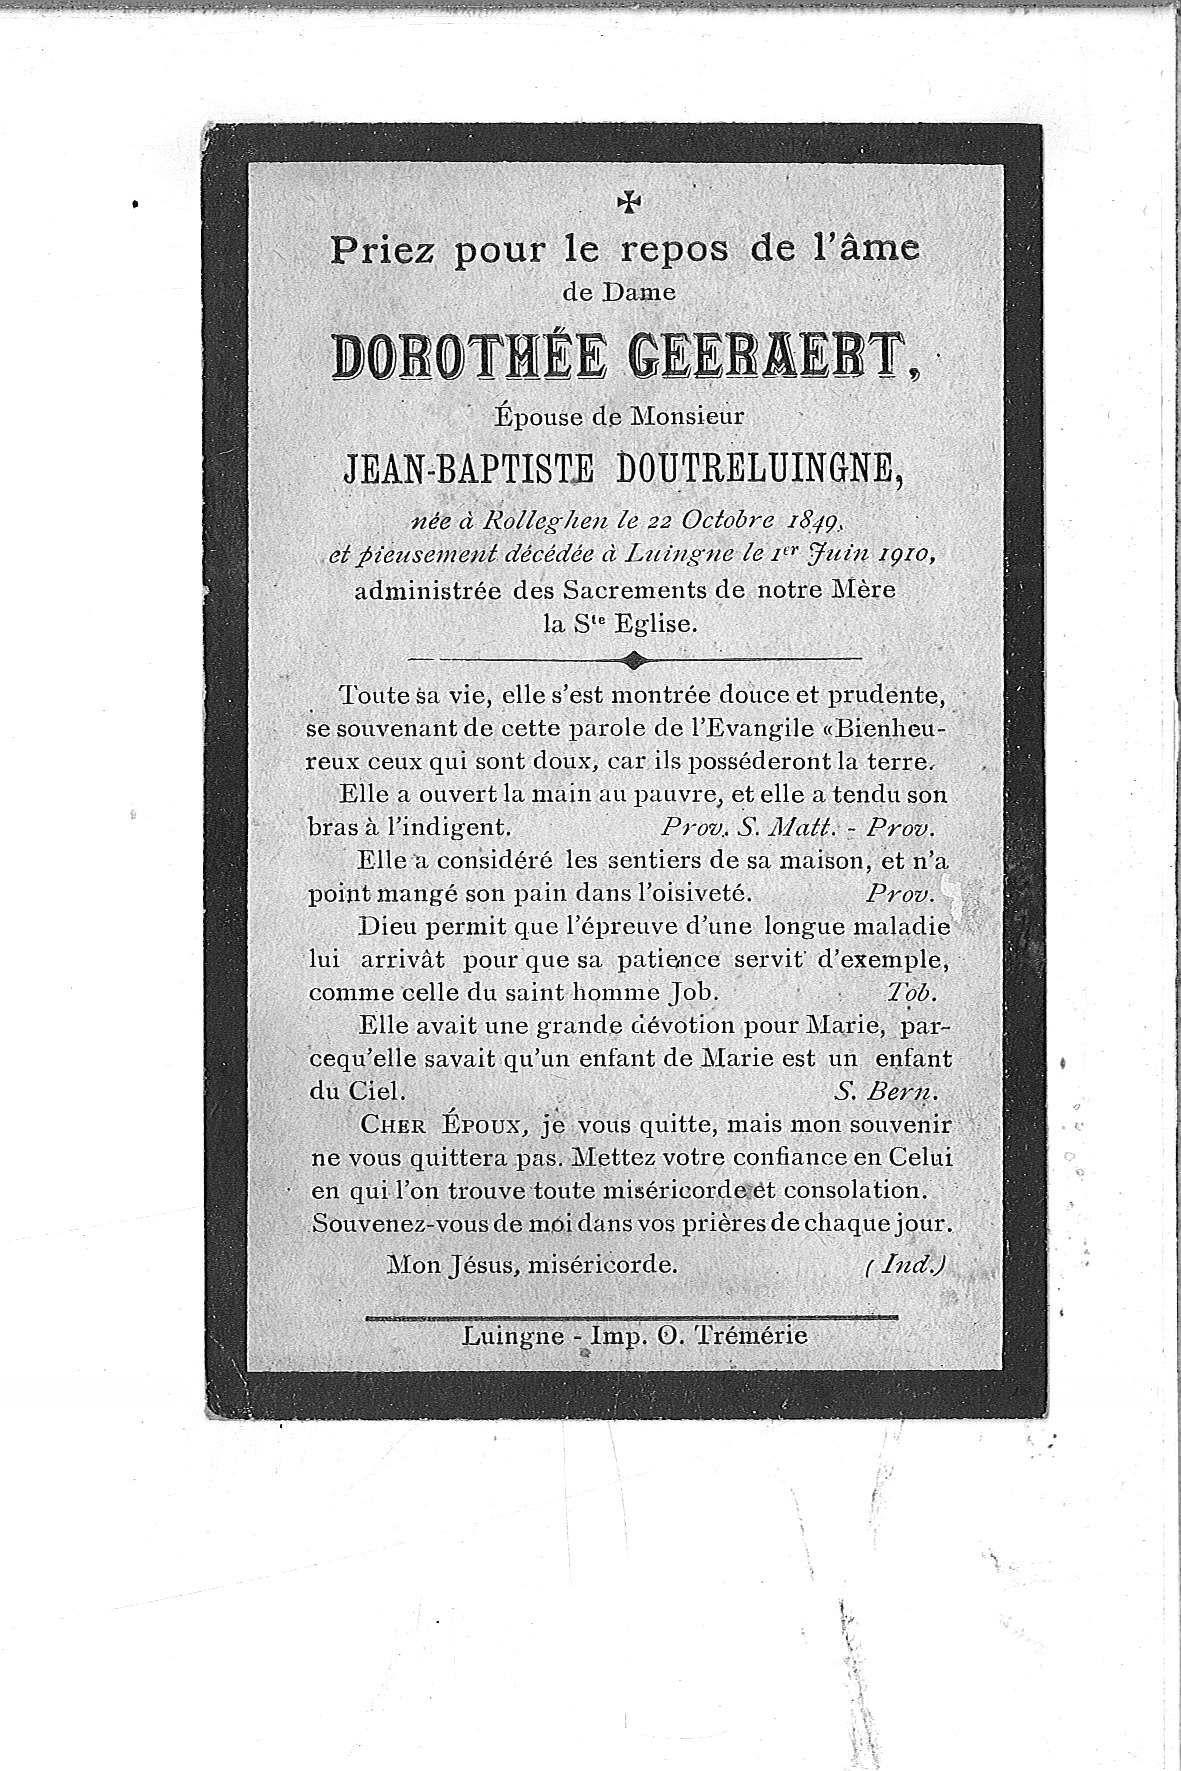 Dorothée(1910)20130822140146_00003.jpg